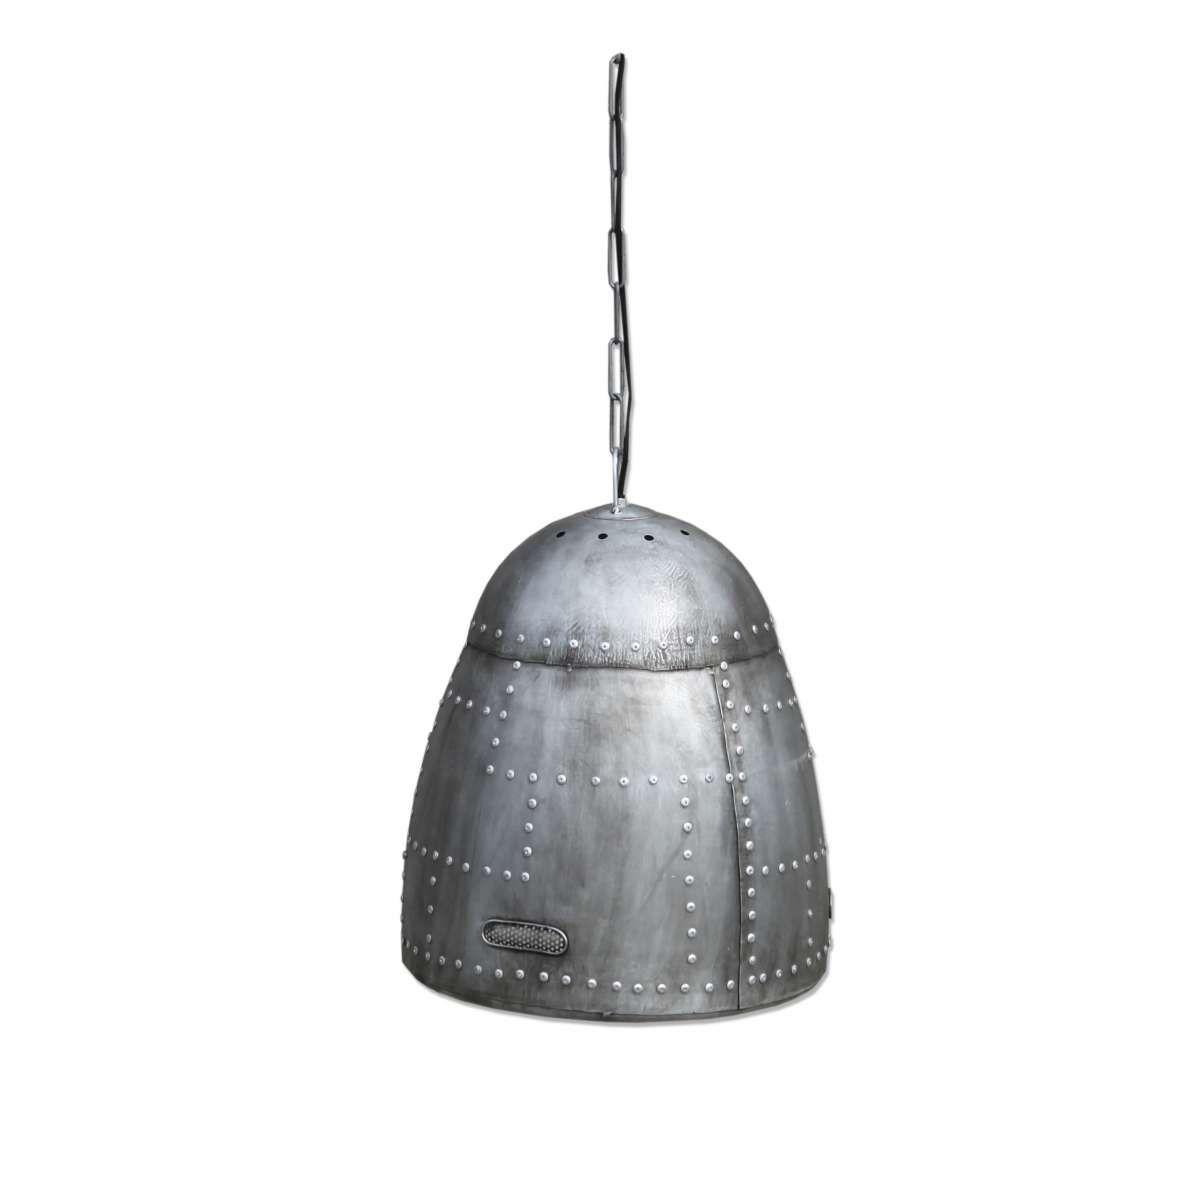 Hängelampe Rivet Industrie Fabriklampe Lampe Deckenlampe